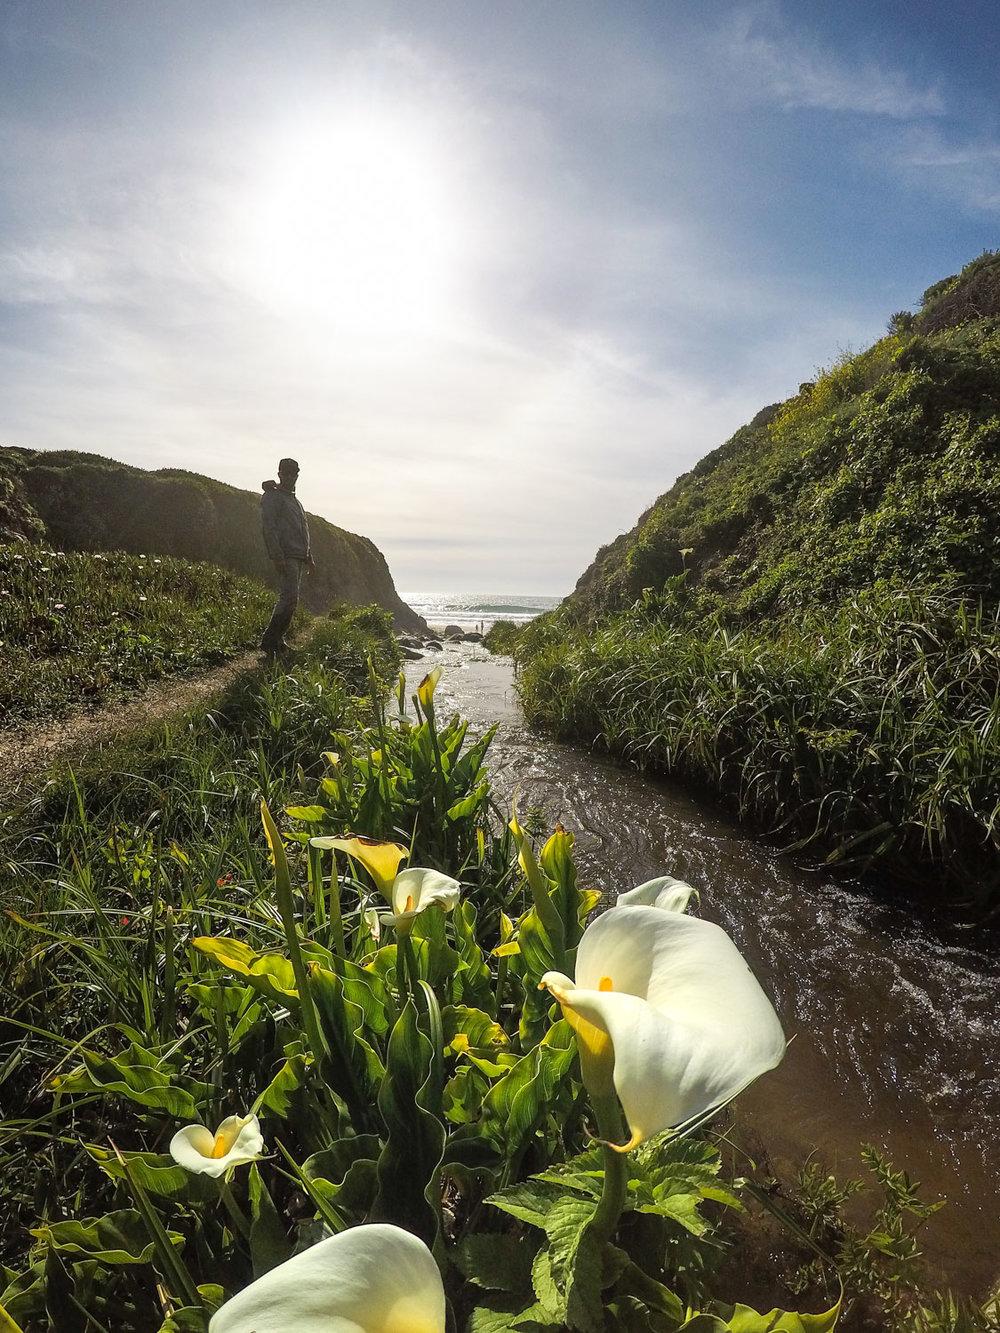 The coastal California version of wildflowers!